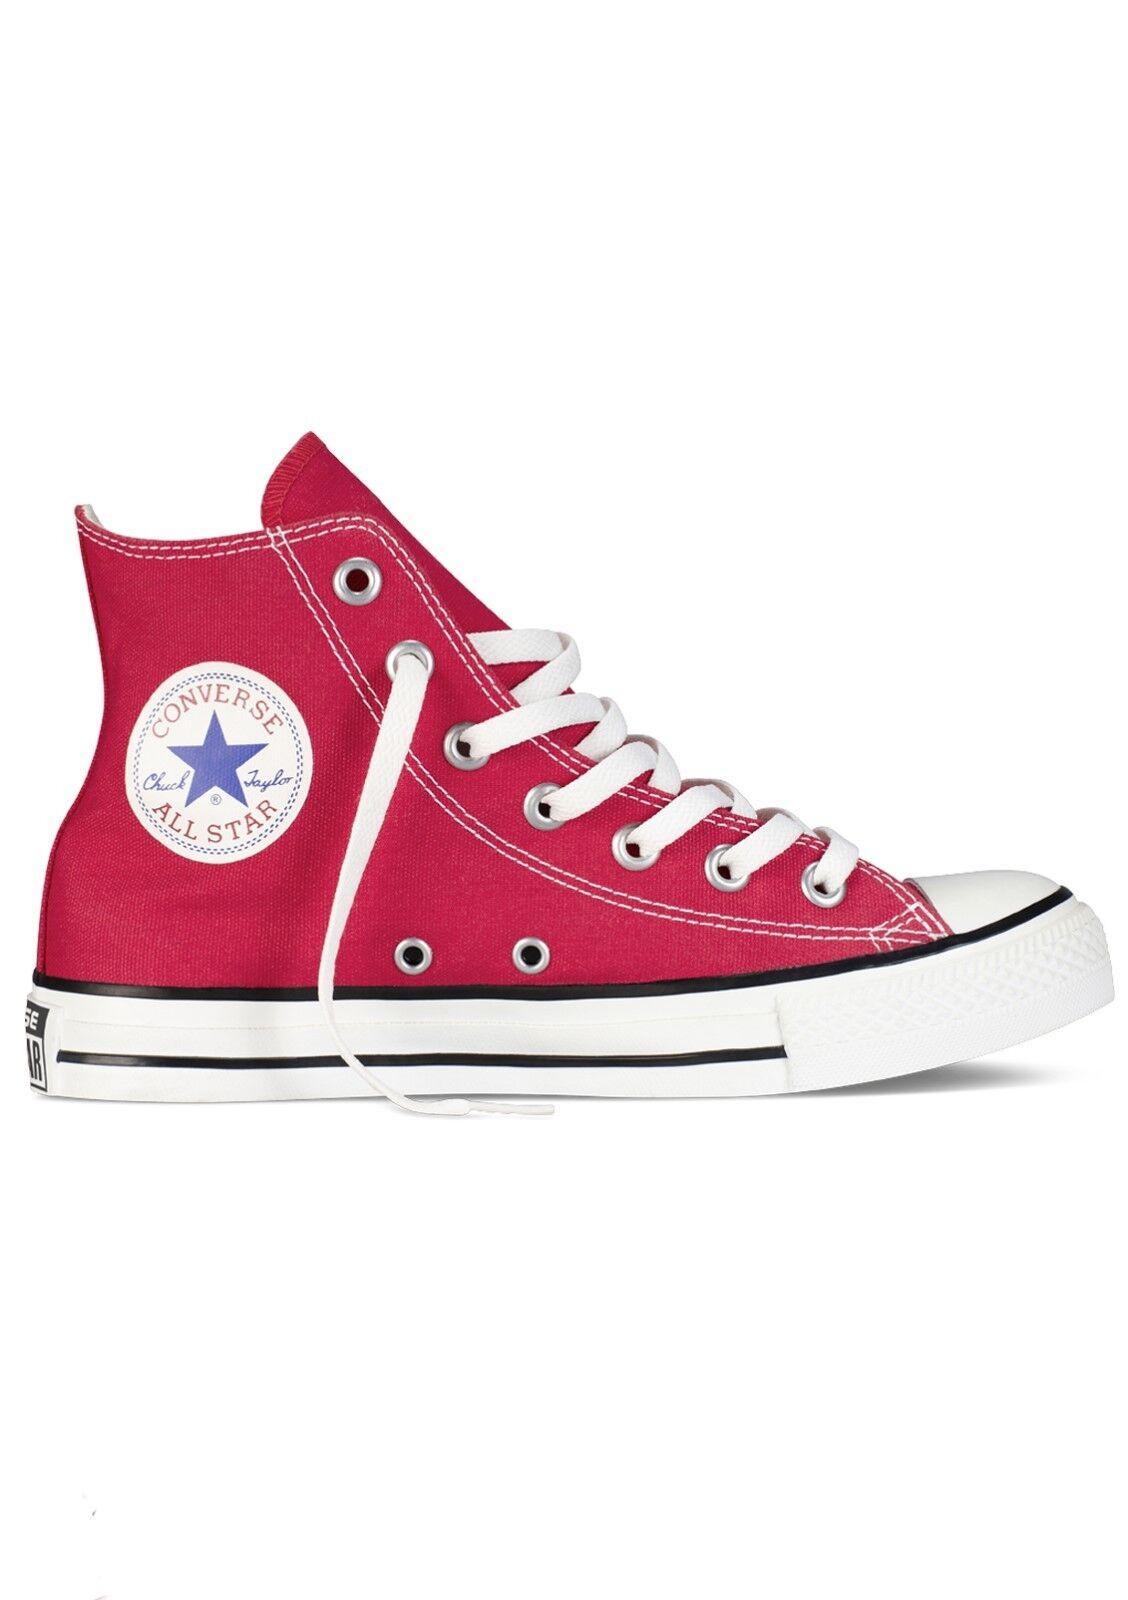 Converse All Star Hi Top Canvas Sneakers Homme 11 Femme 13 NIB Free Ship